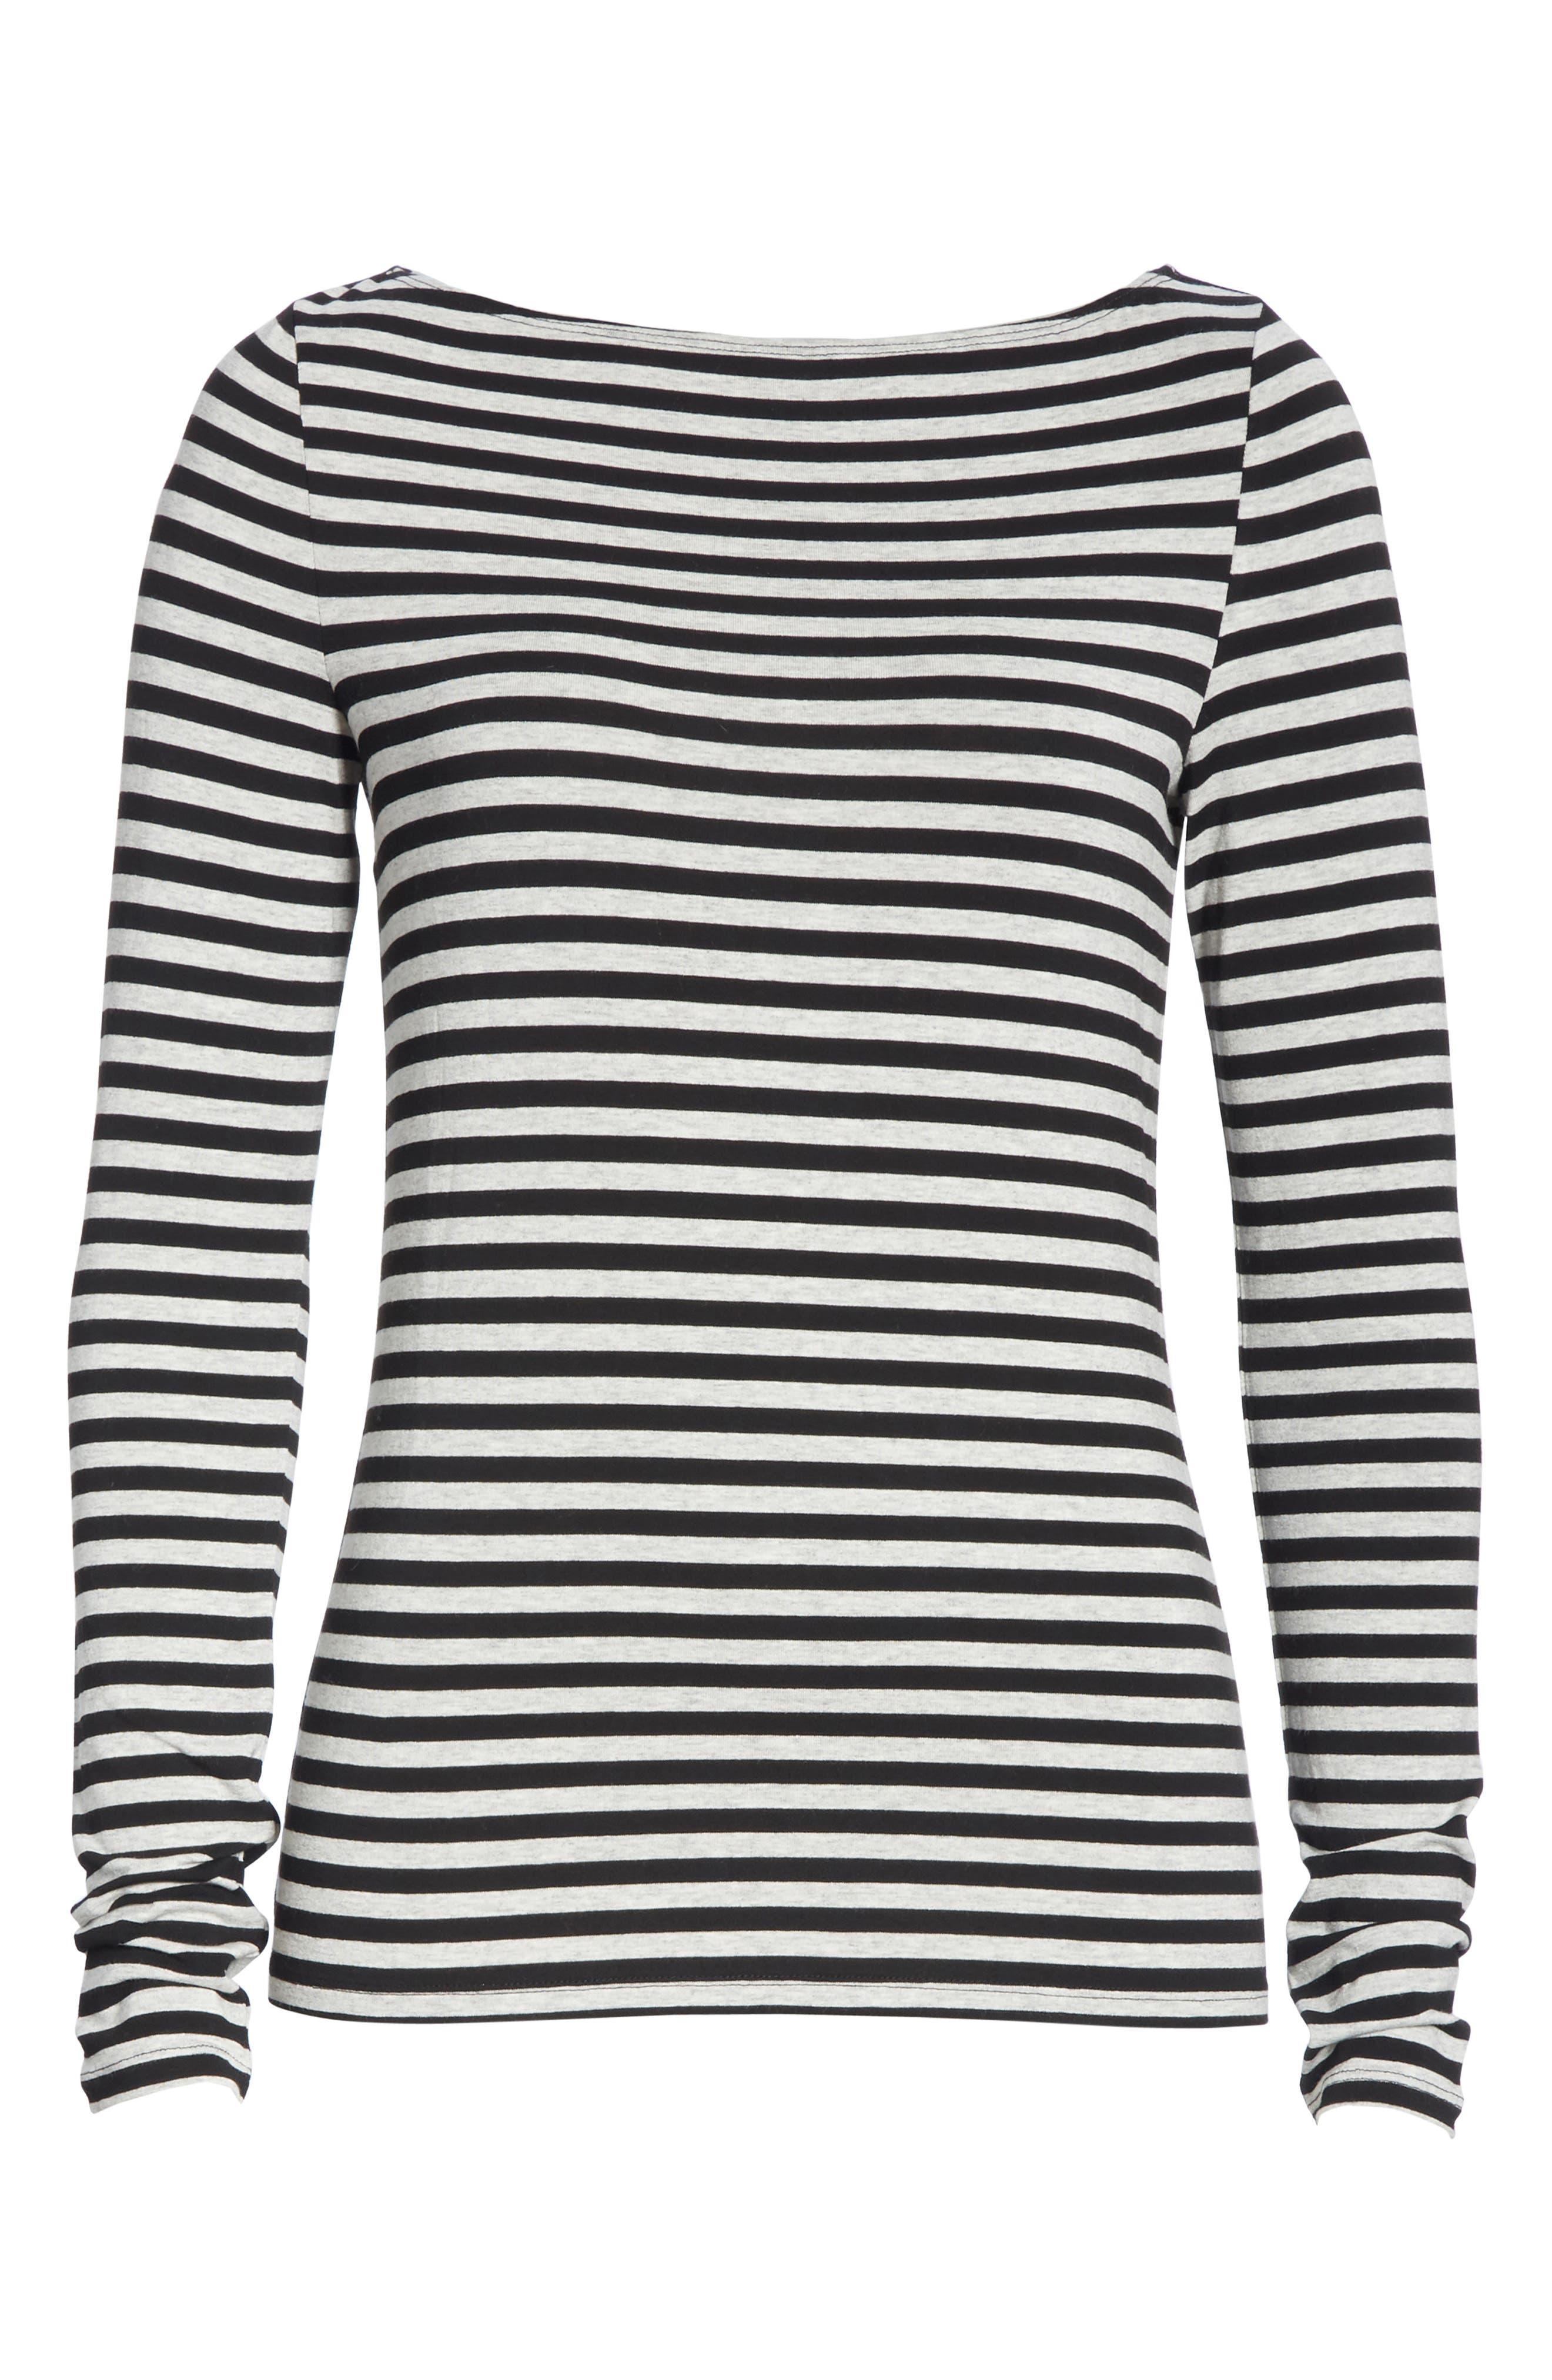 Stripe Bateau Neck Long Sleeve Tee,                             Alternate thumbnail 6, color,                             HEATHER GREY- BLACK STRIPE